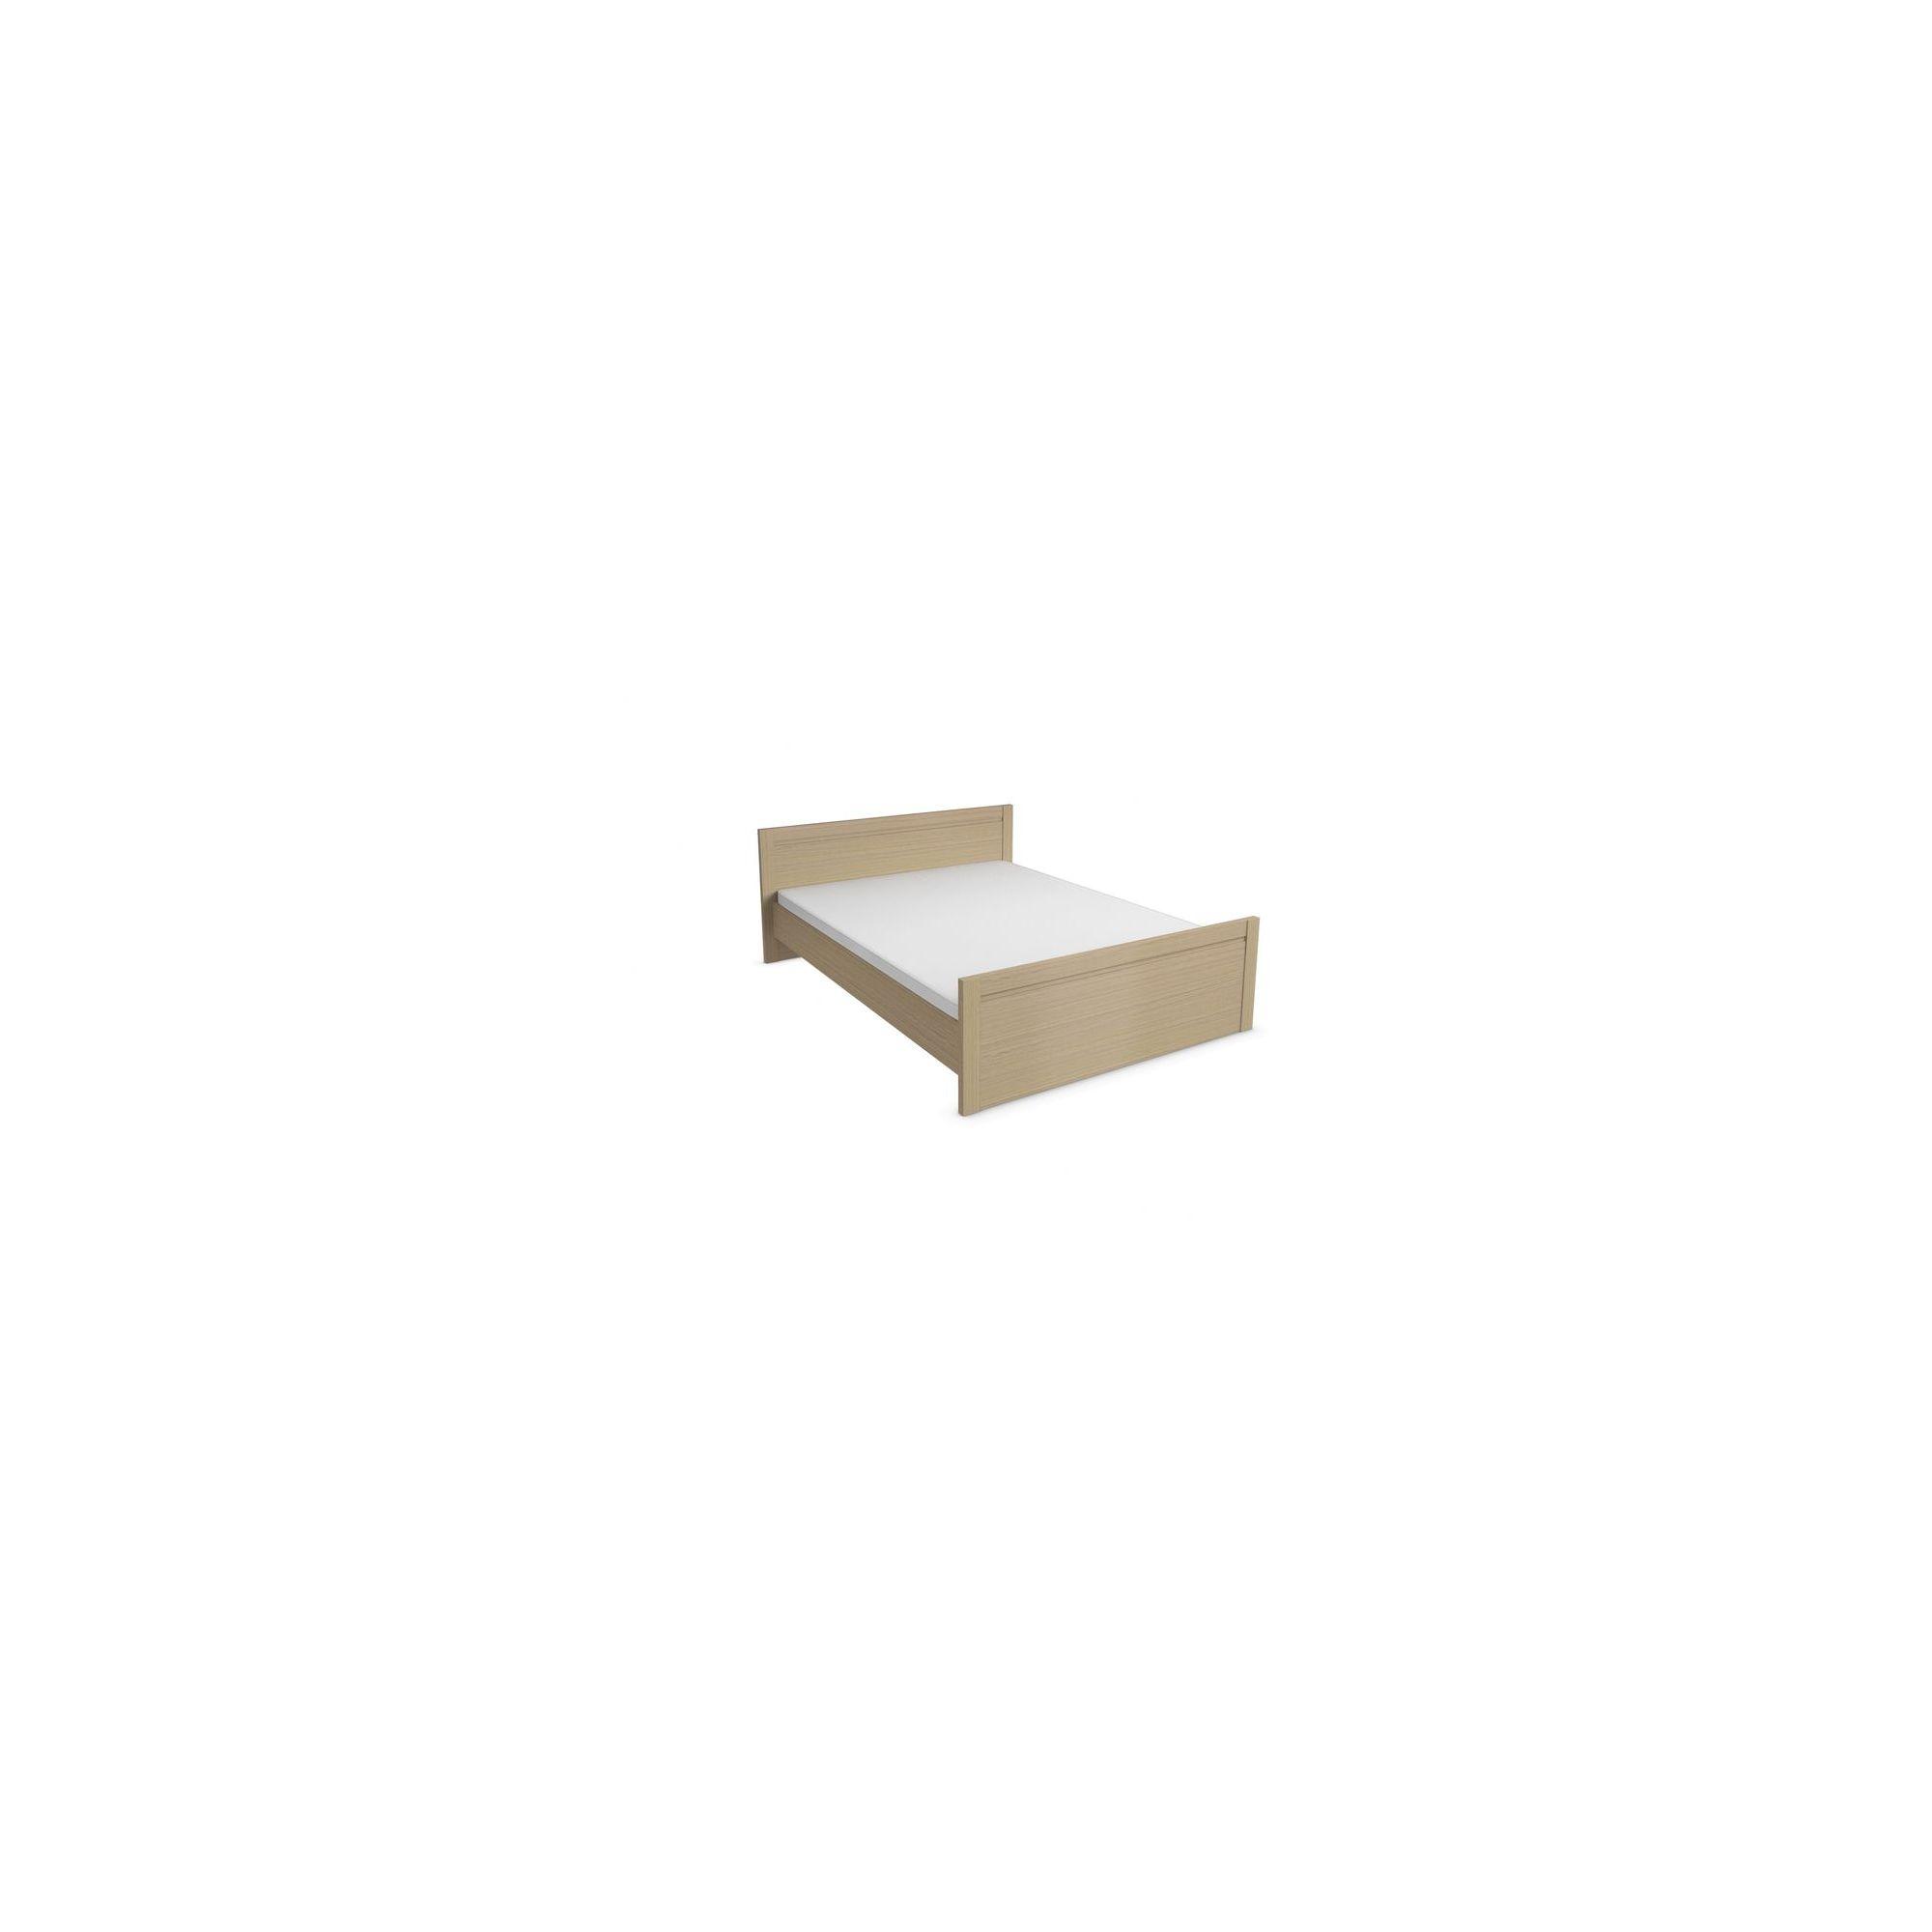 Urbane Designs Tango Bed Frame - Light Oak - King at Tesco Direct